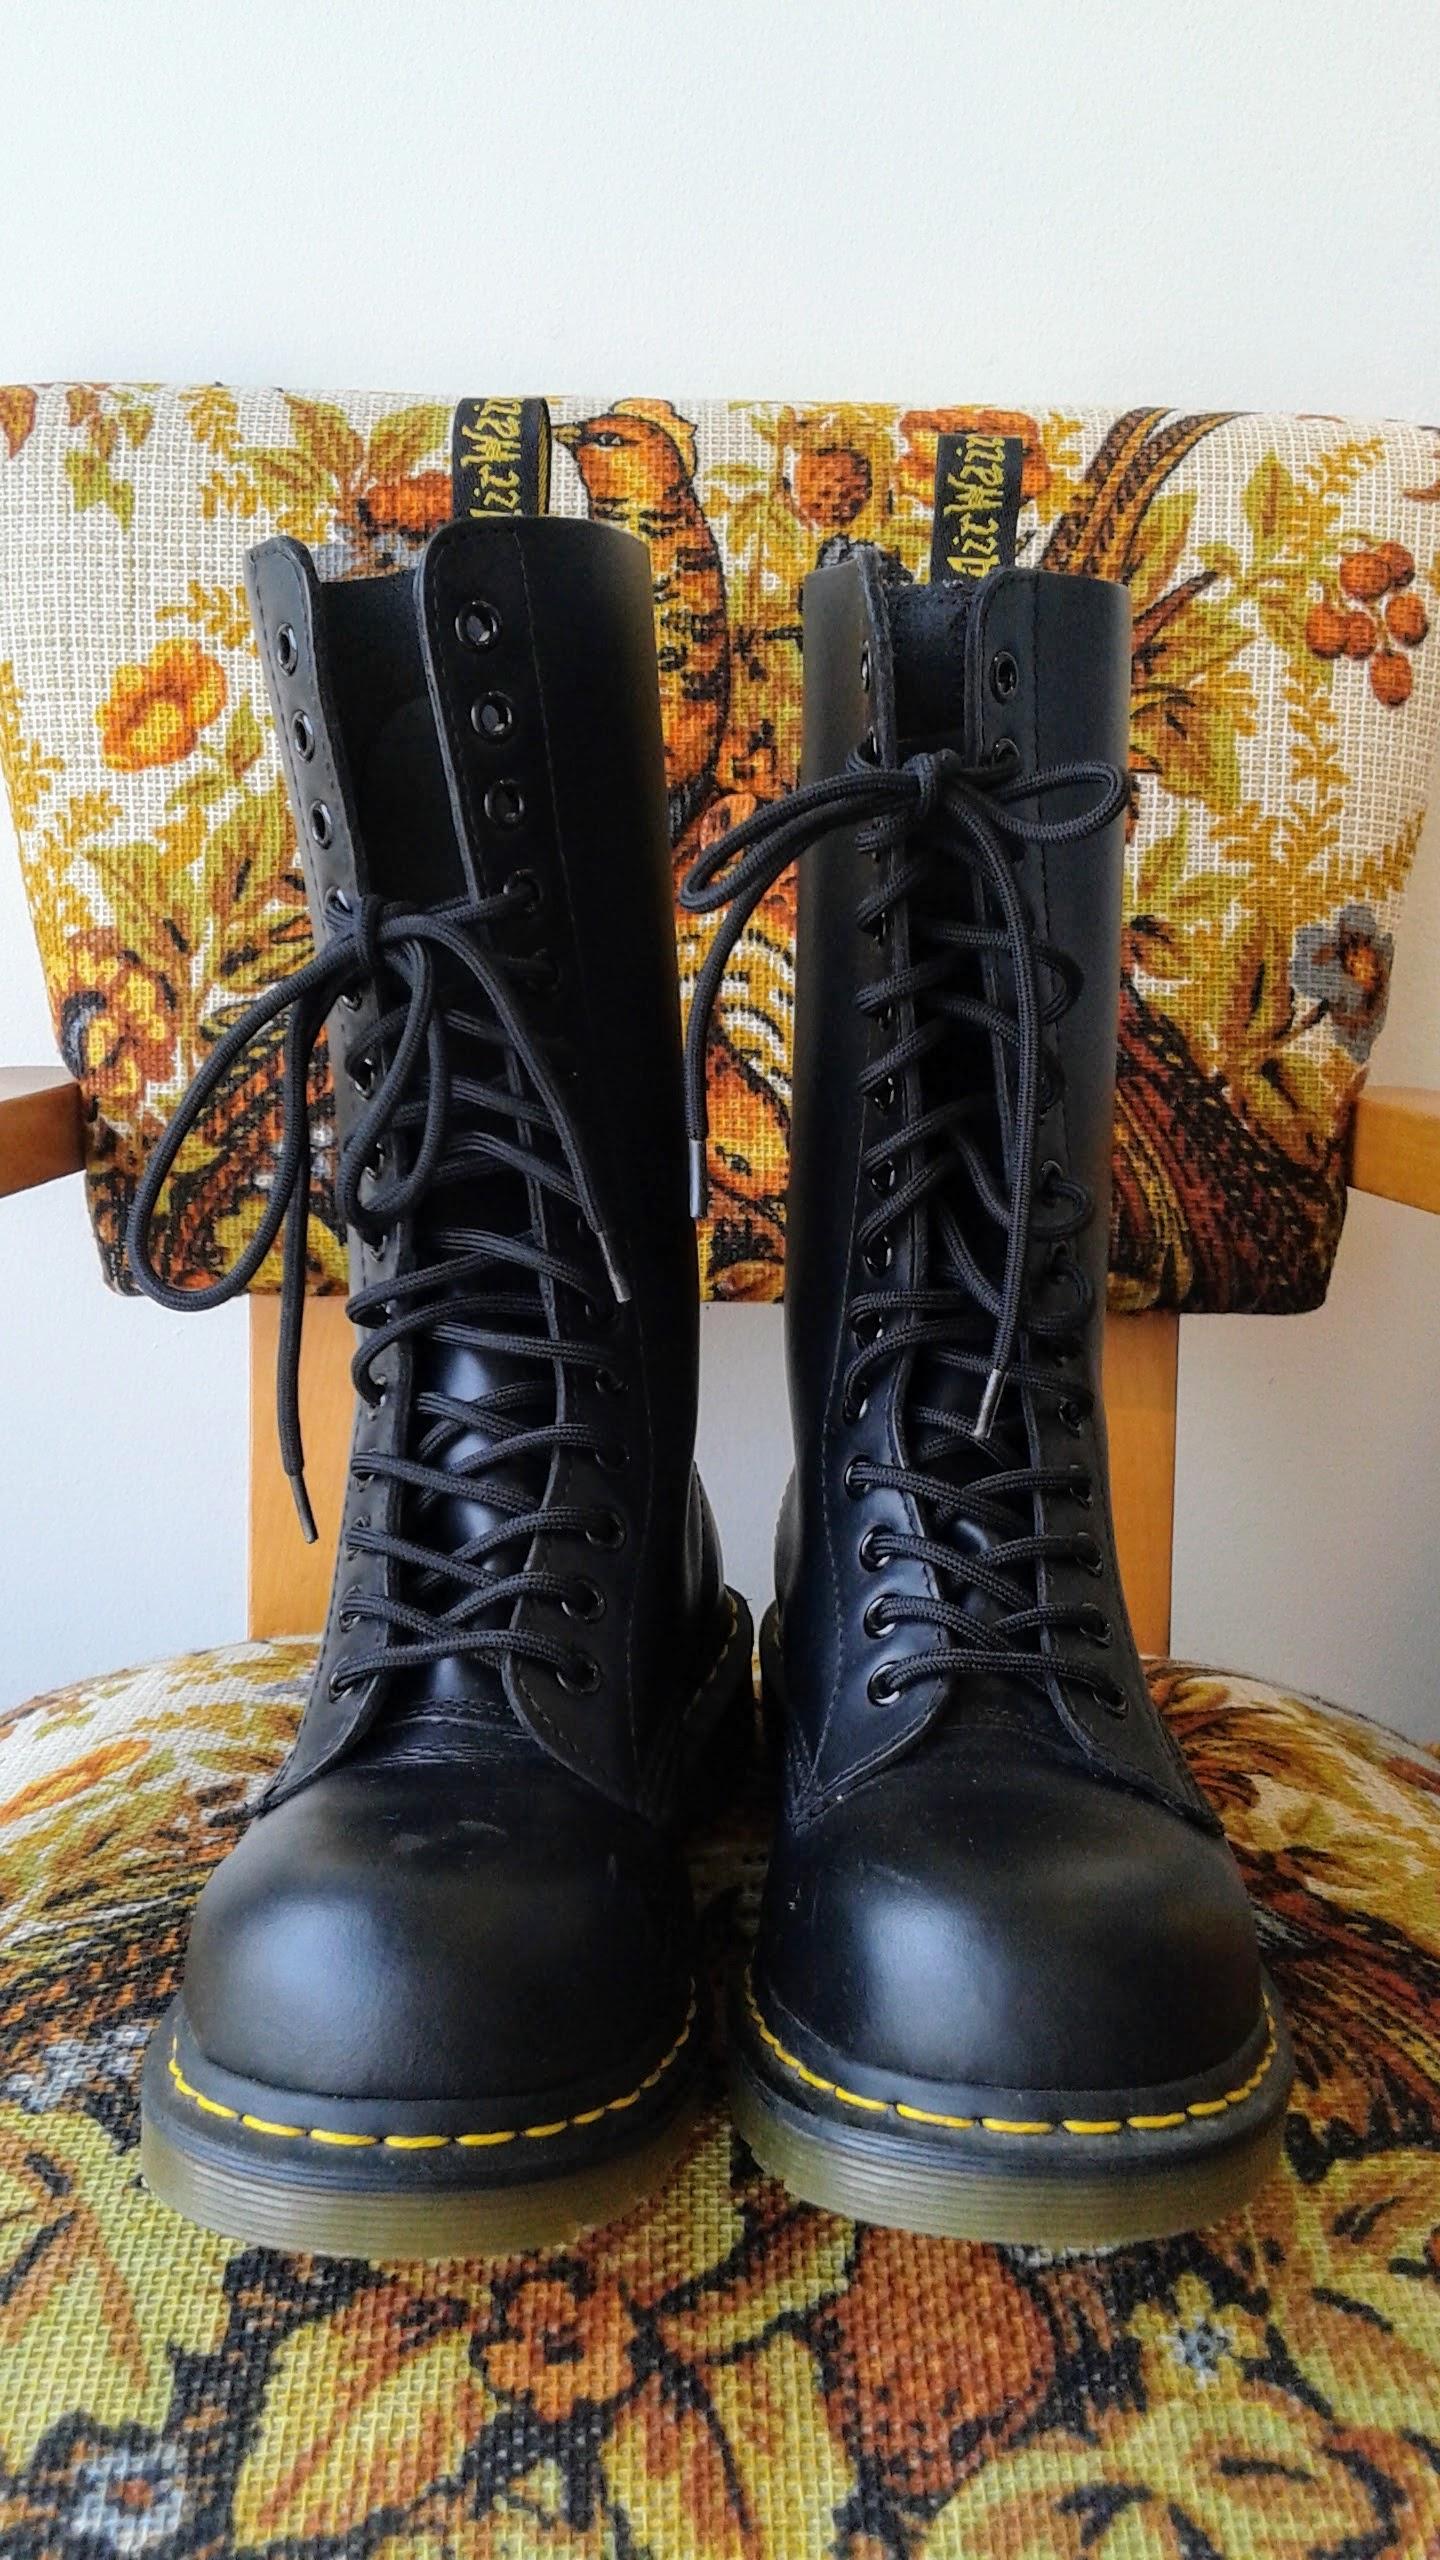 Doc Martens boots; S7, $145